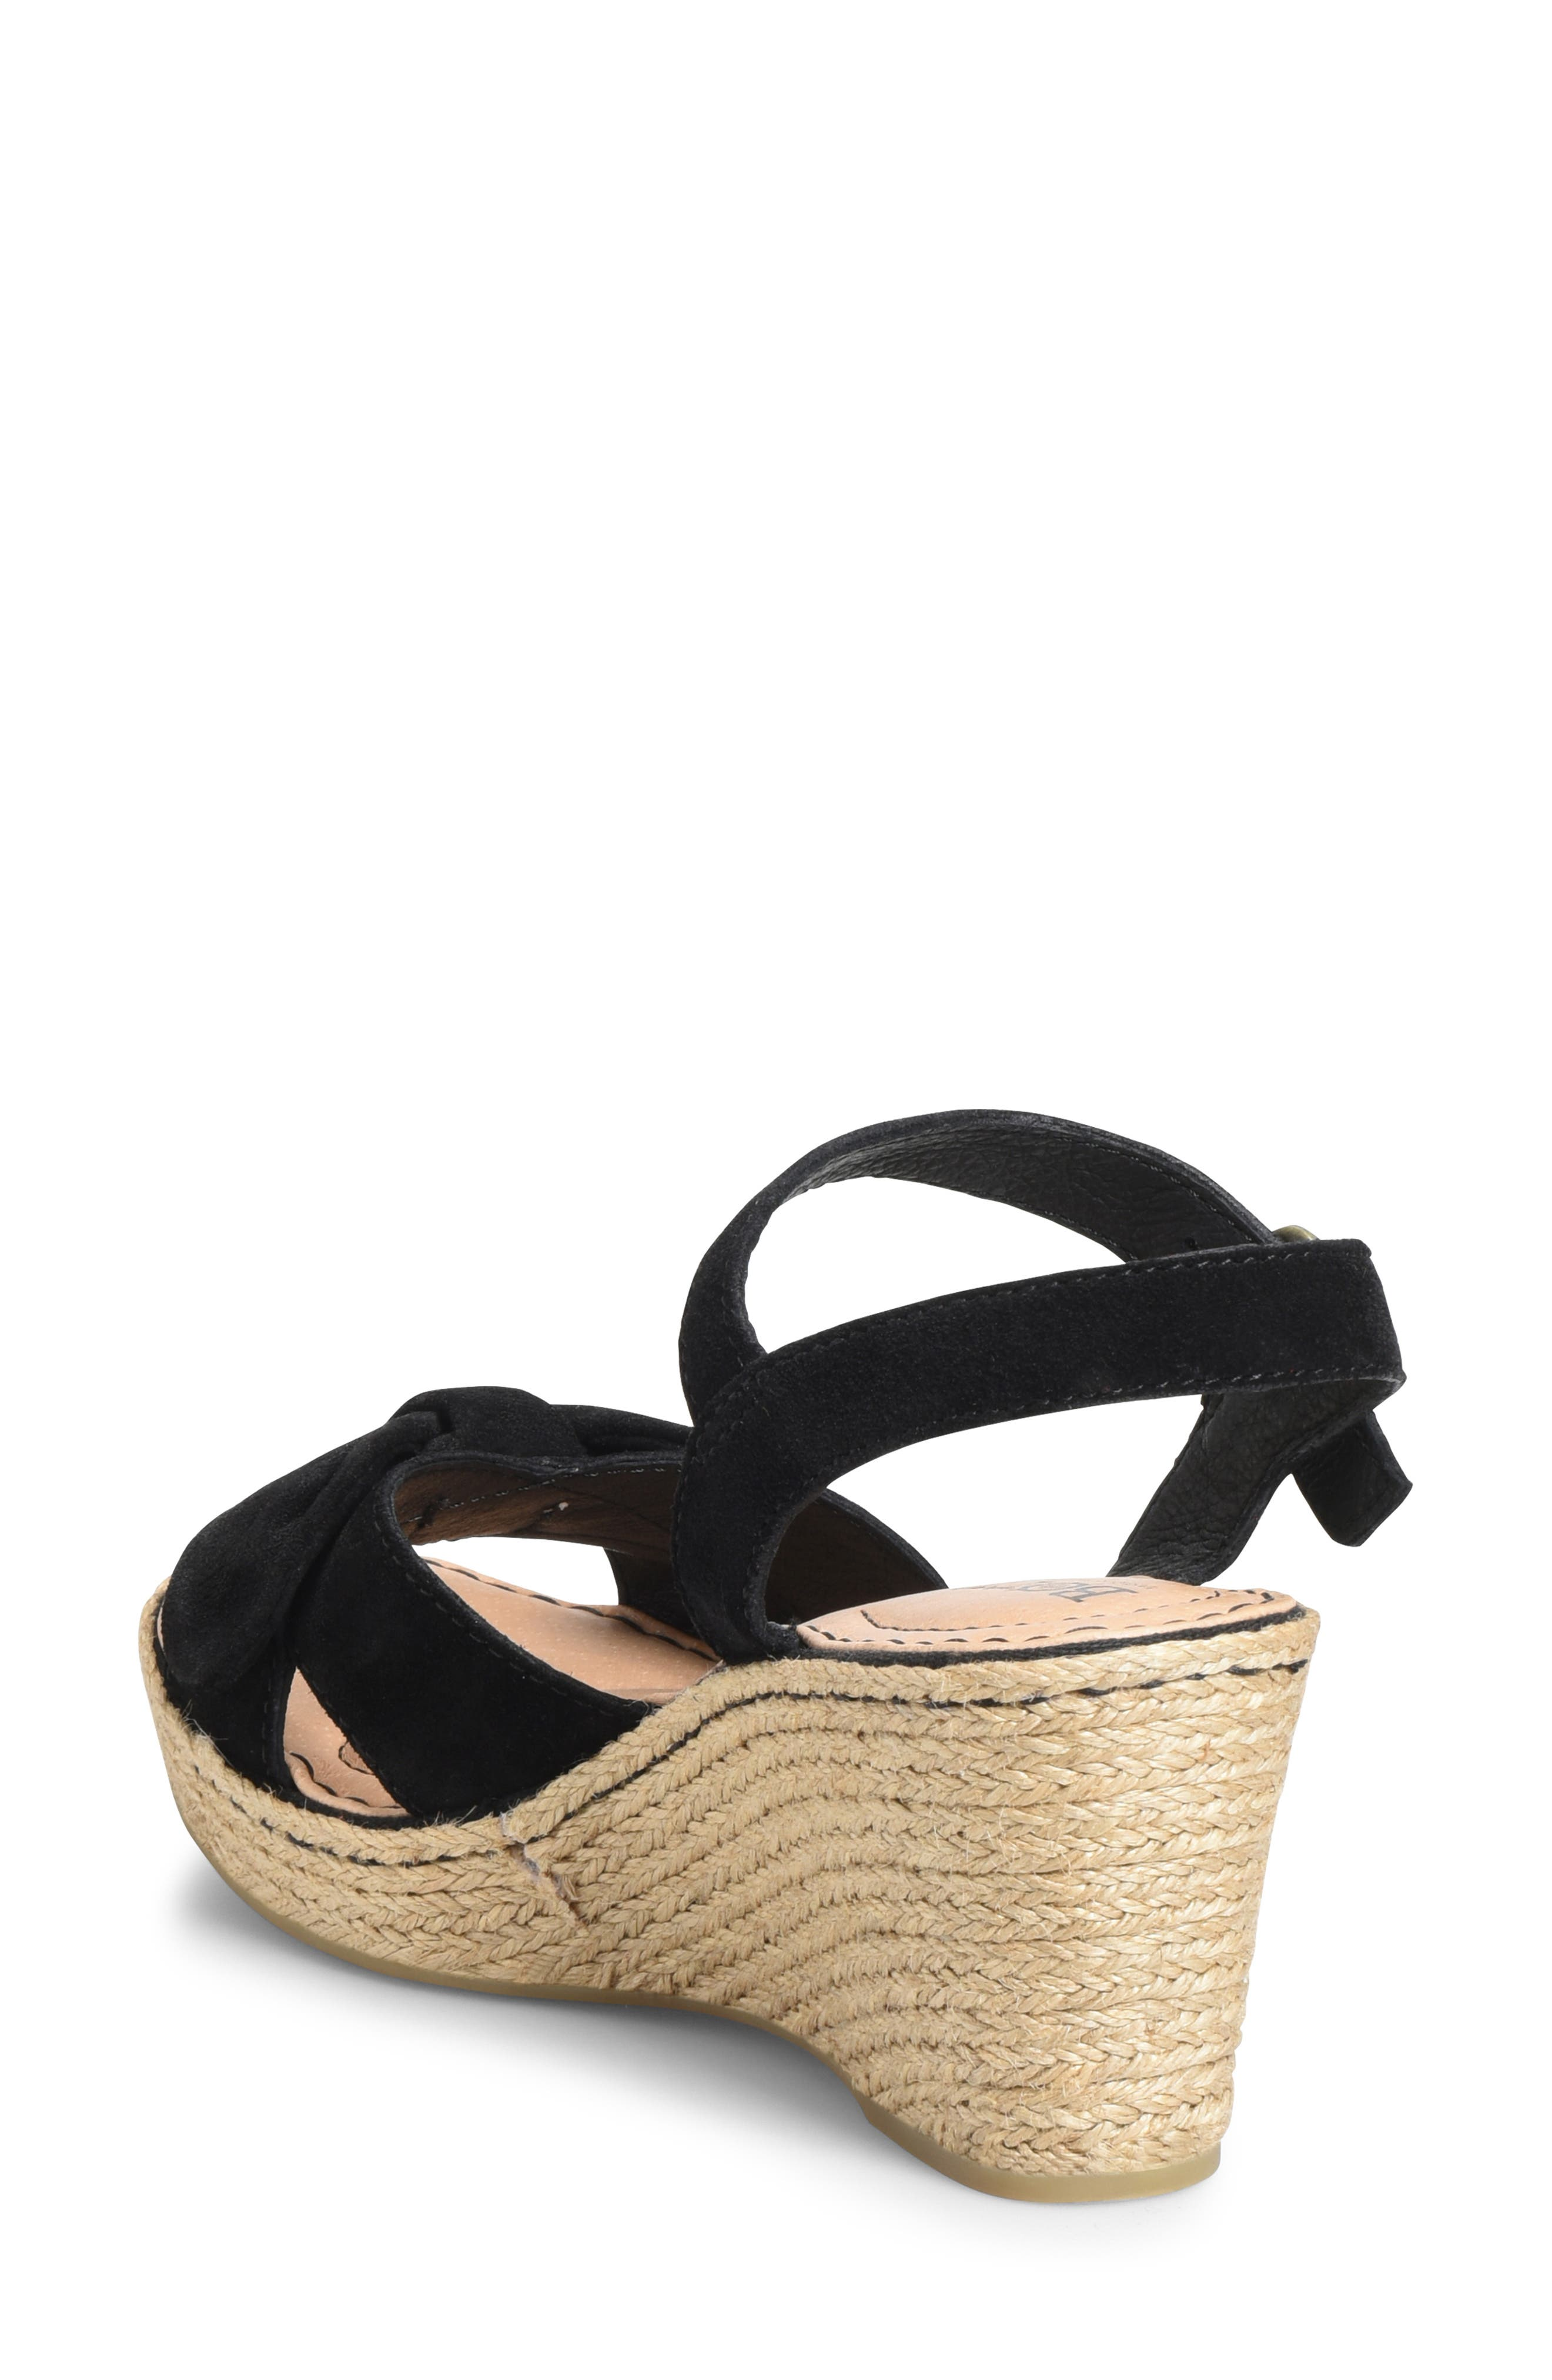 BØRN, Monticello Knotted Wedge Sandal, Alternate thumbnail 2, color, BLACK SUEDE